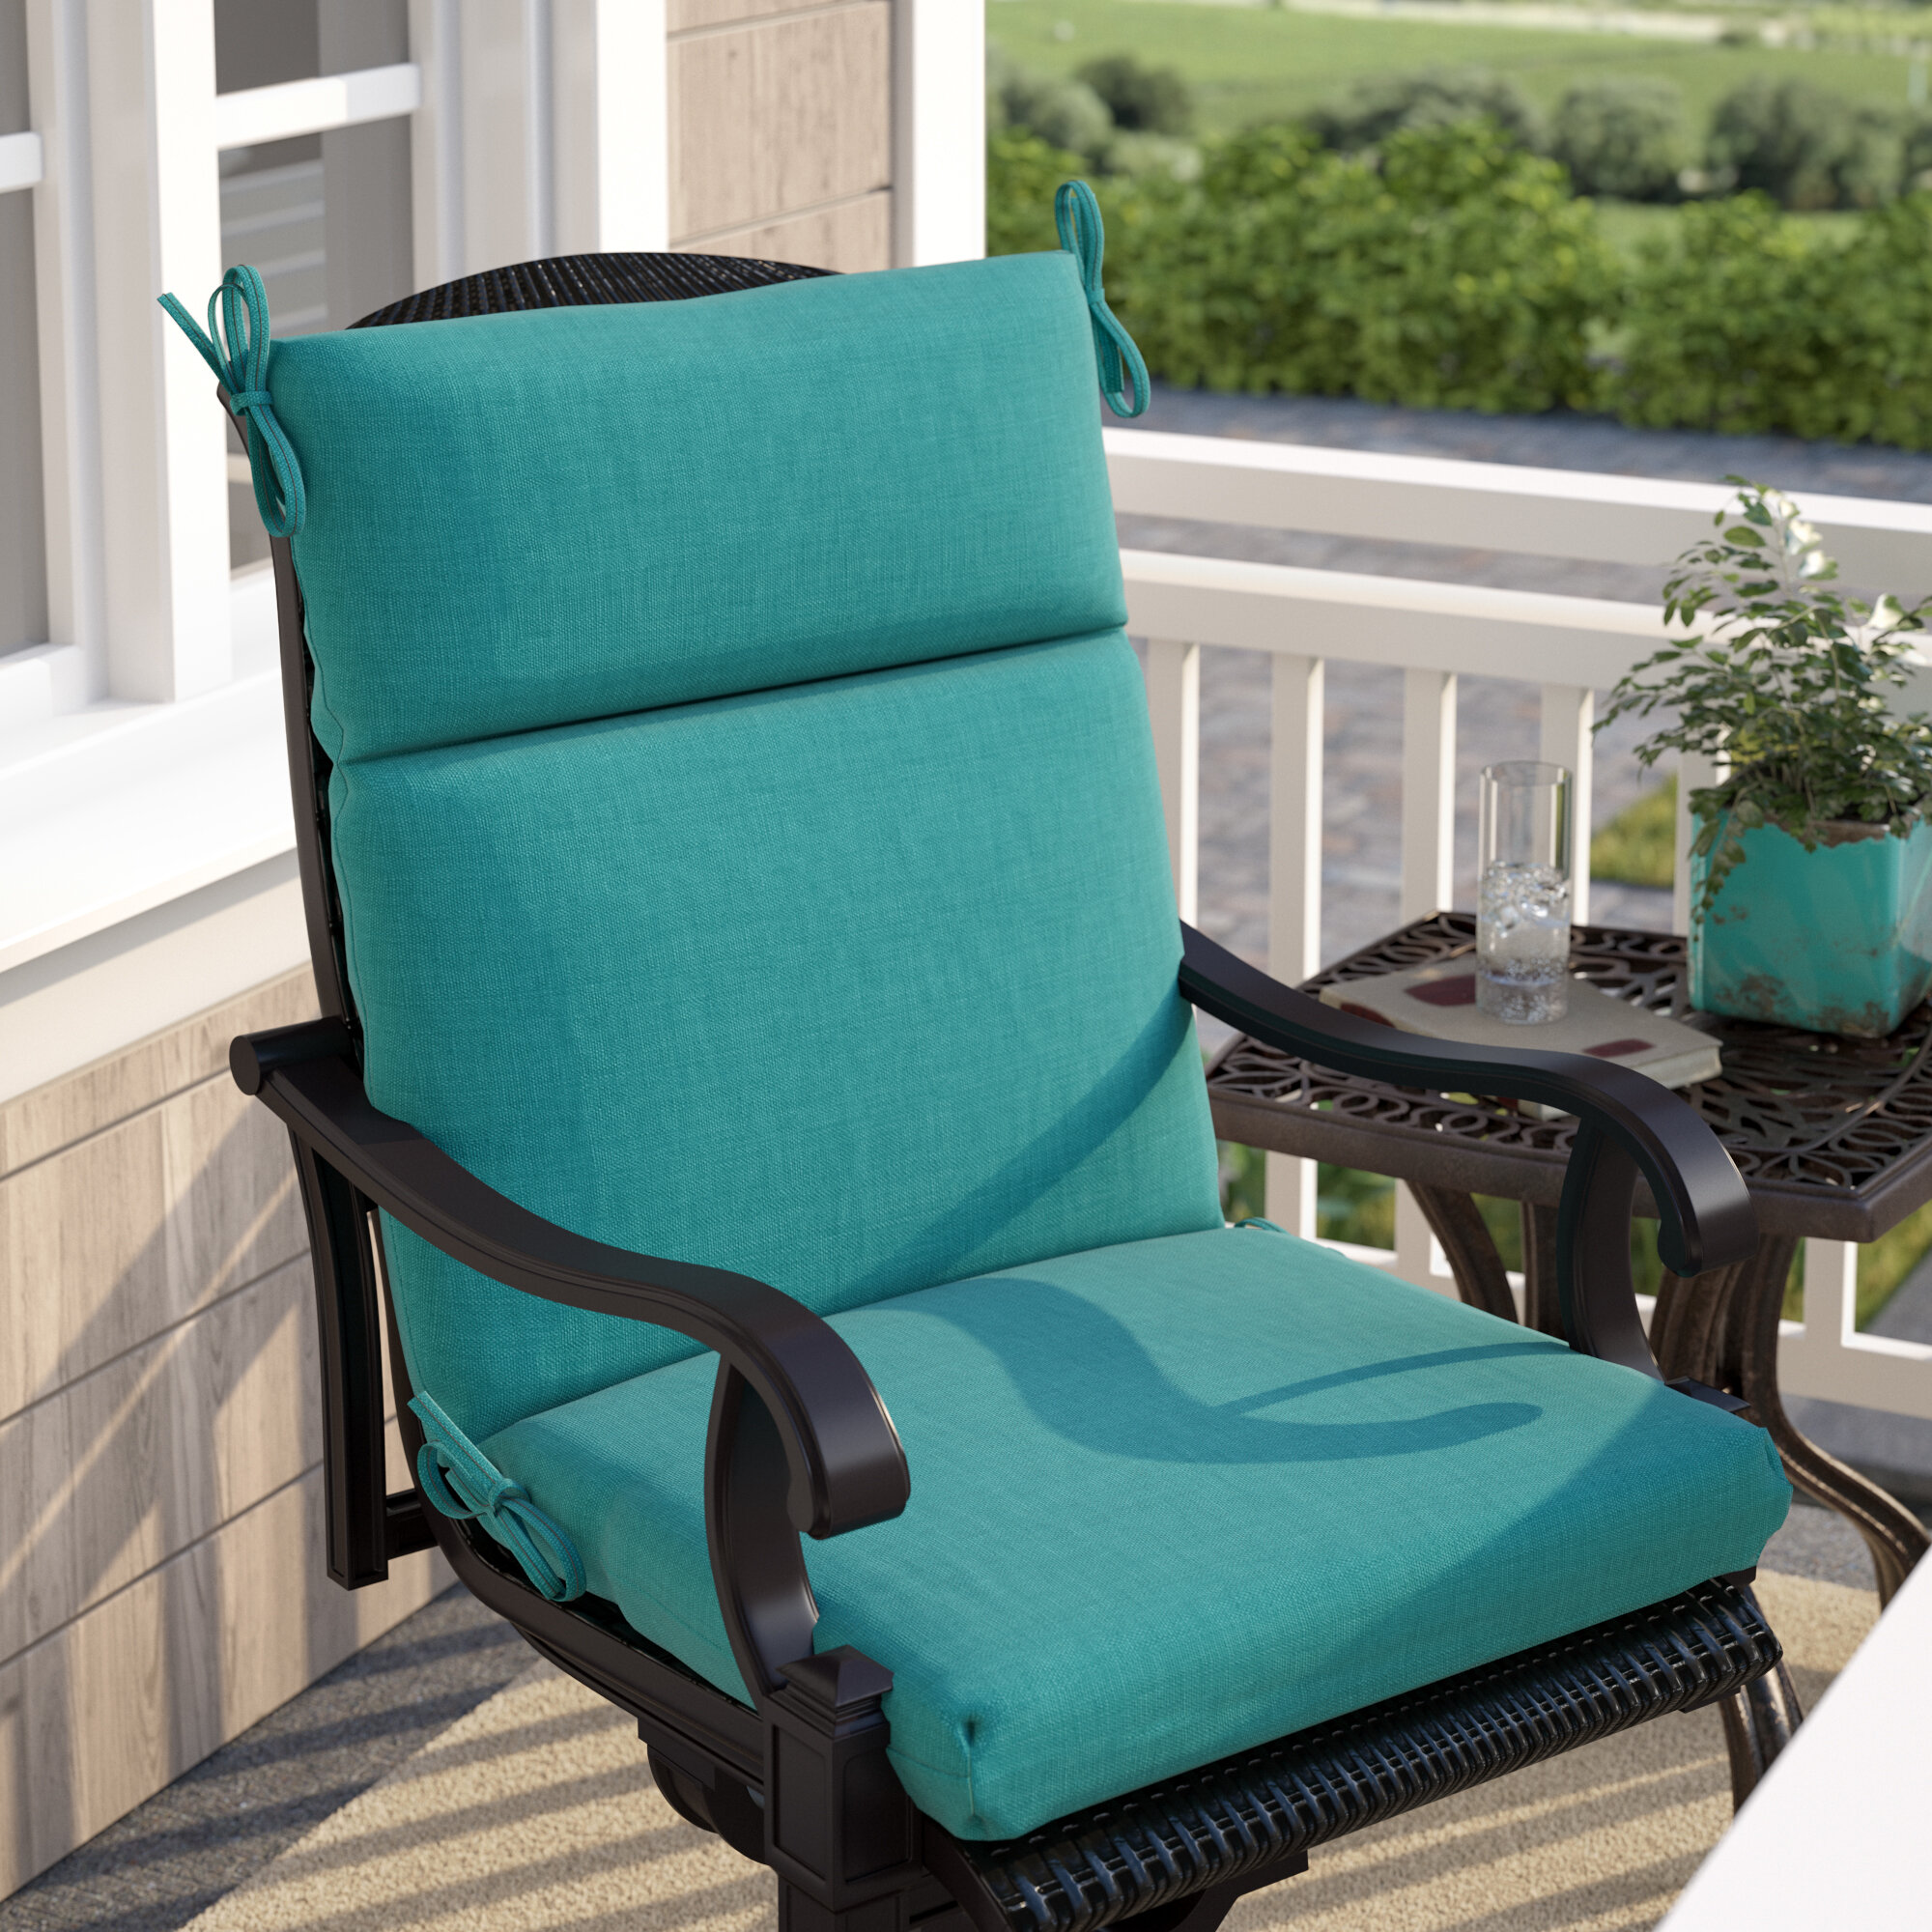 Prime Indoor Outdoor Lounge Chair Cushion Download Free Architecture Designs Sospemadebymaigaardcom